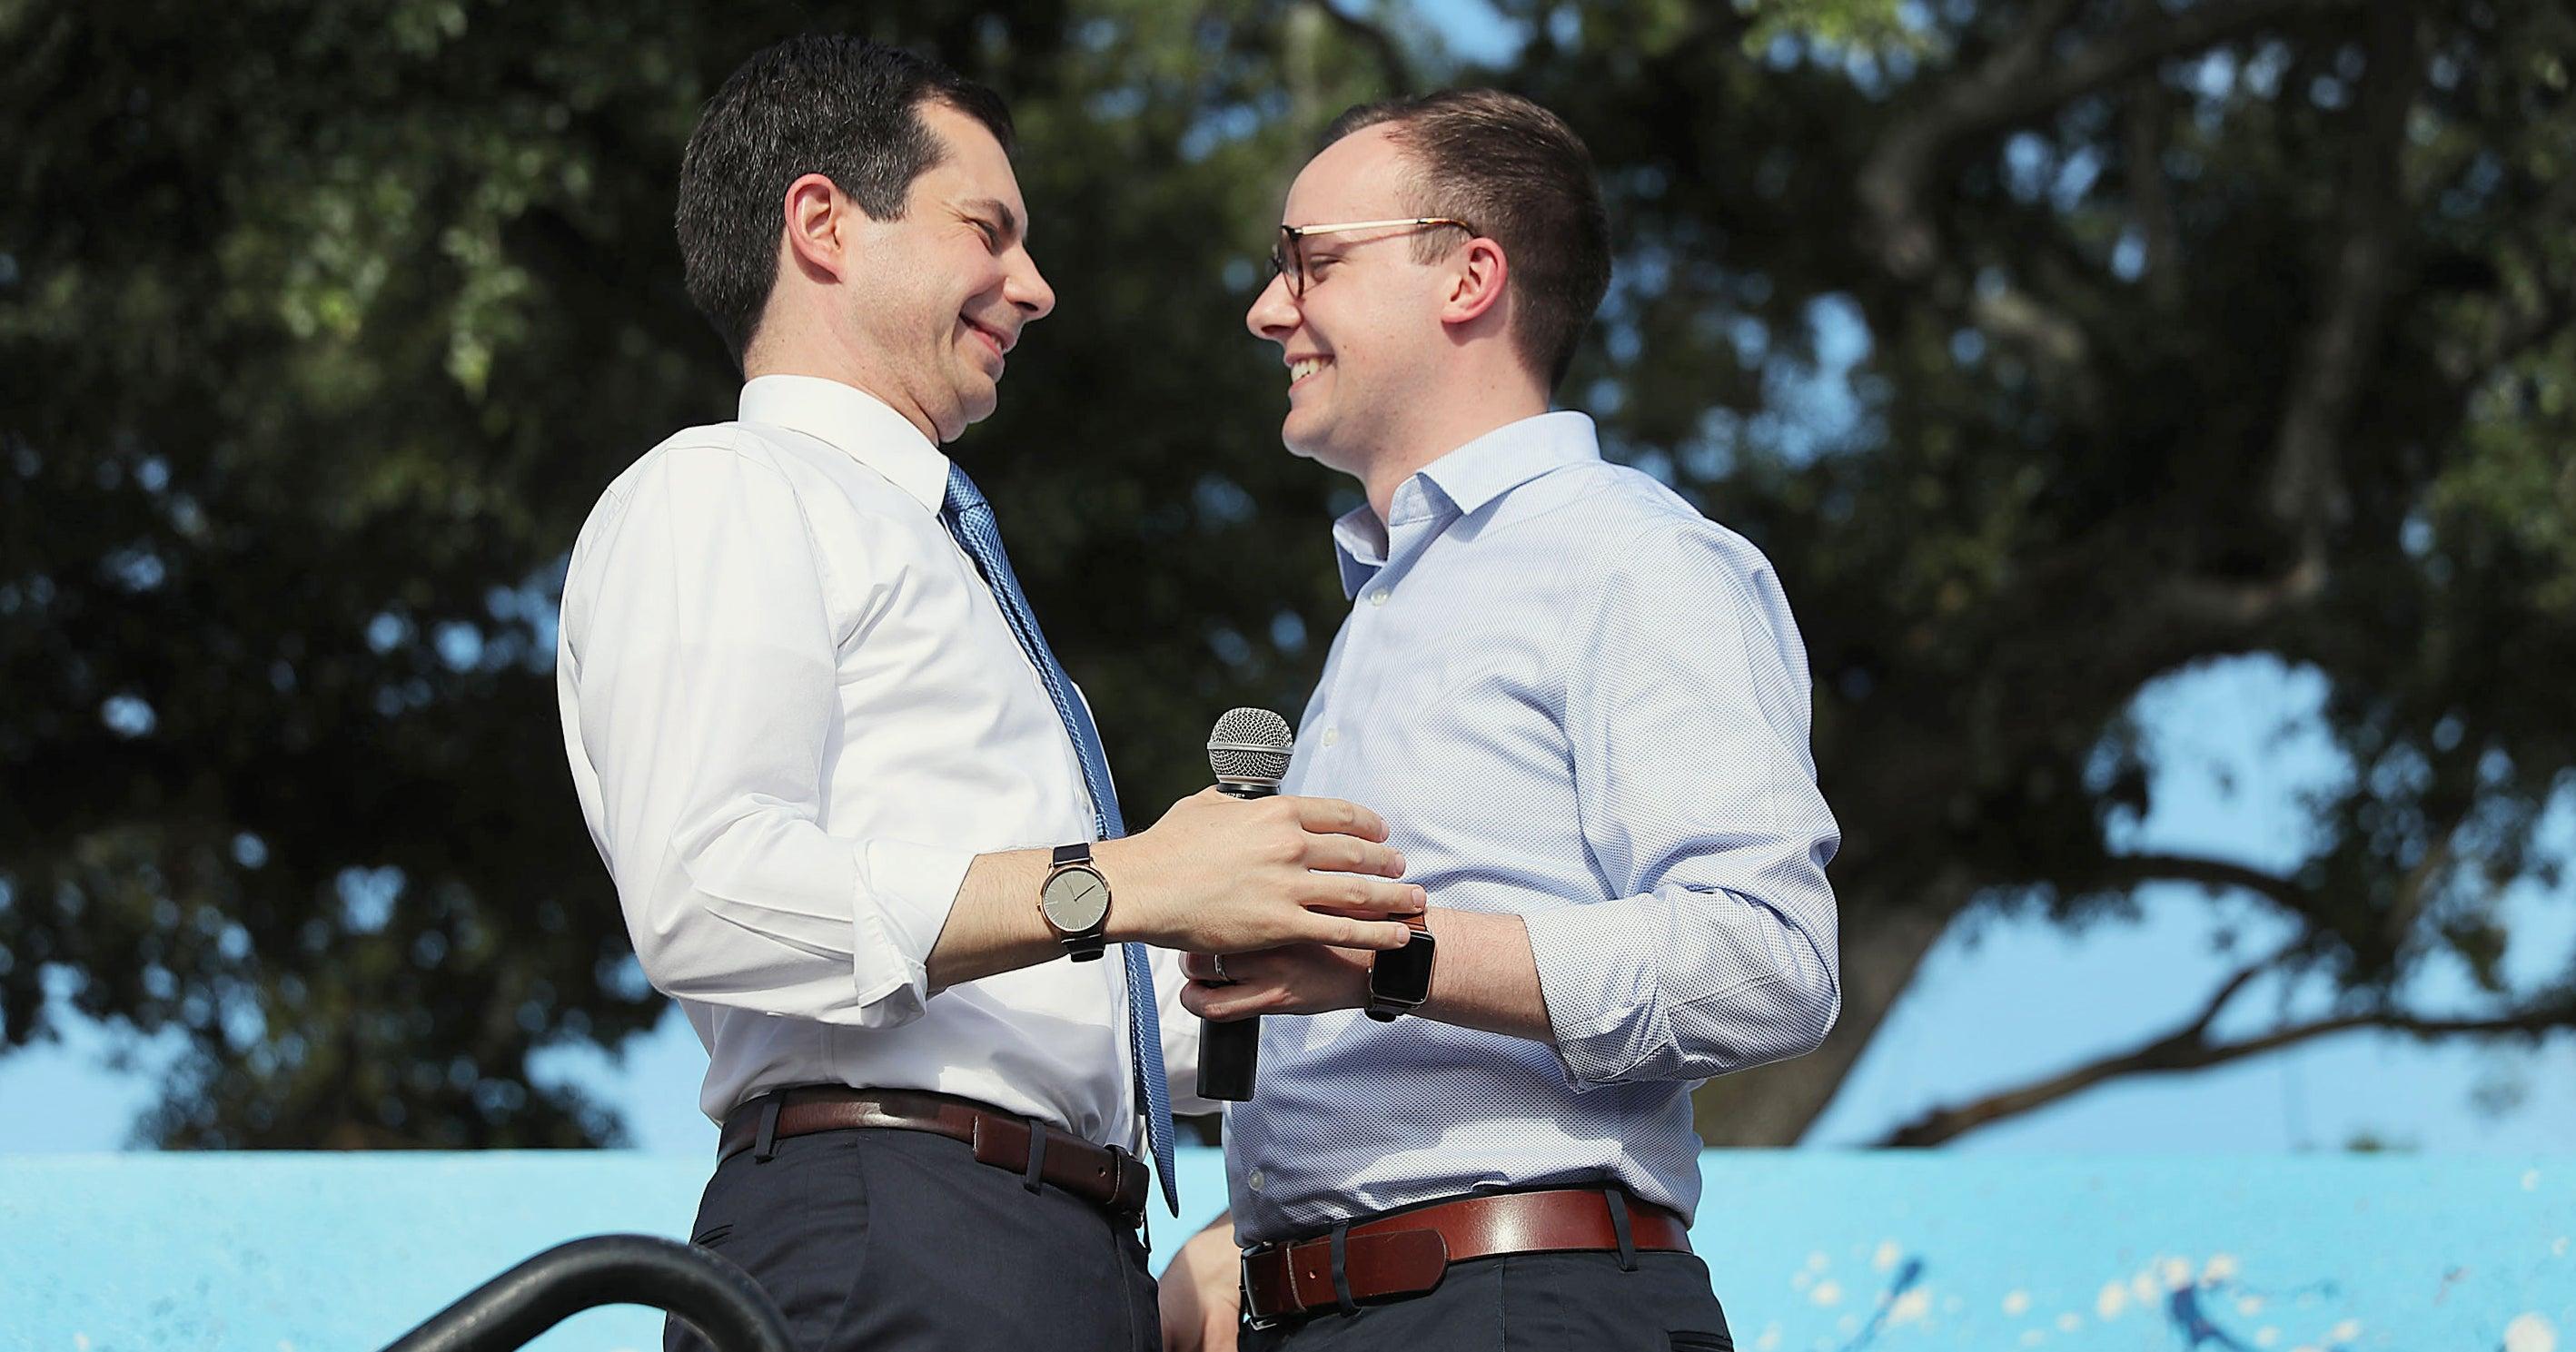 Pete & Chasten Buttigieg's Relationship Is Winning Us Over This Election Season